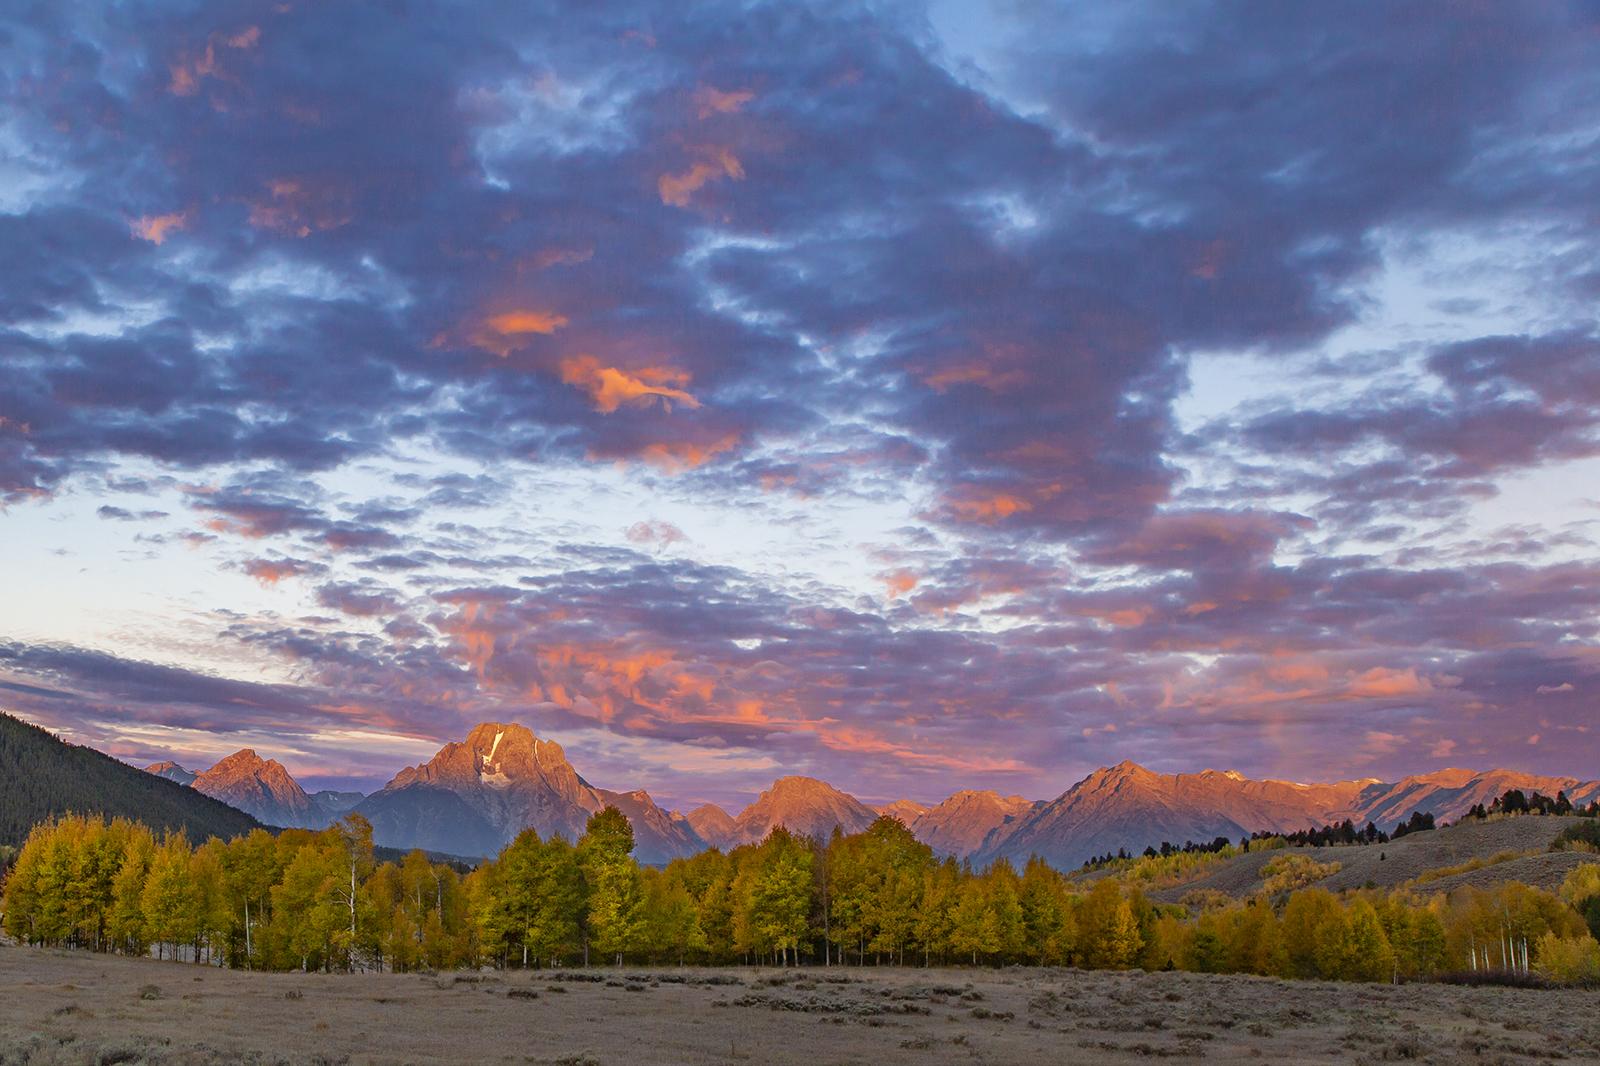 Sunrise on Mt. Moran, Grand Teton National Park (Composite Image)